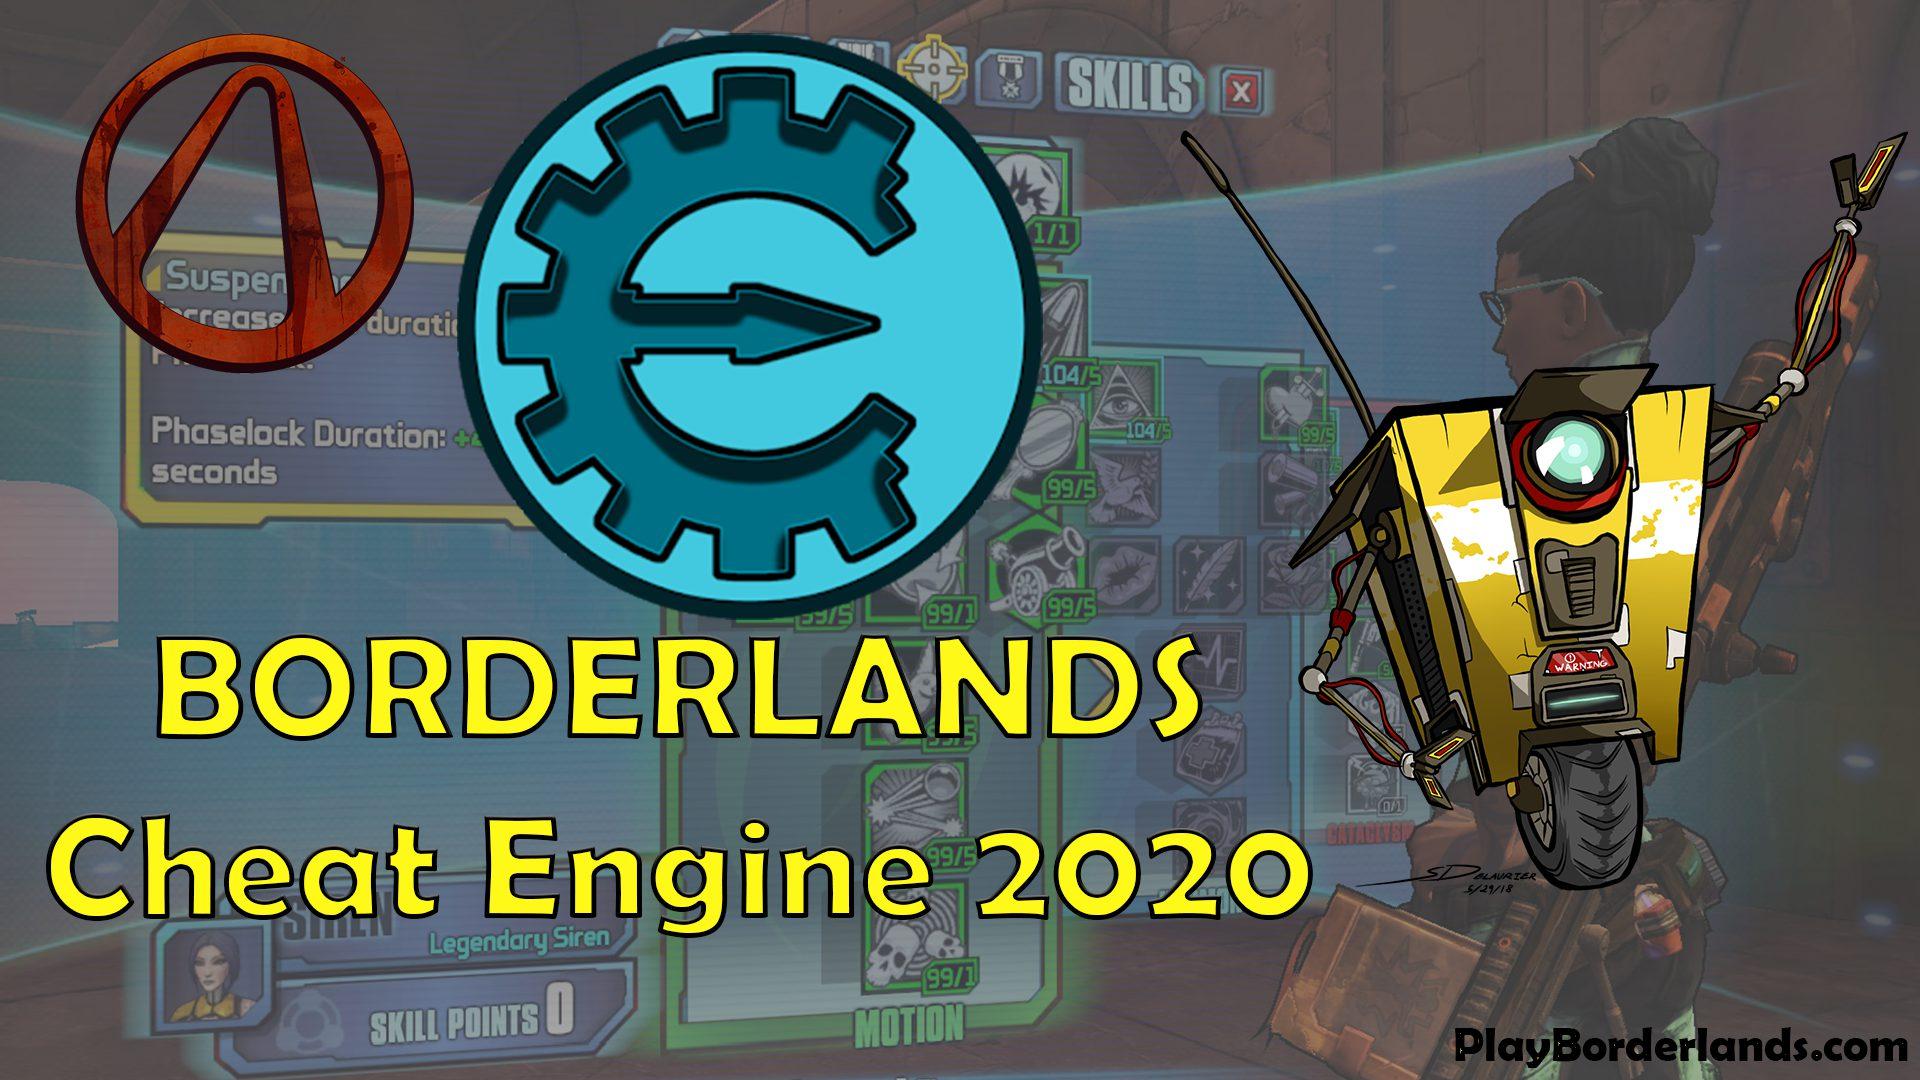 Play Borderlands Cheat engine